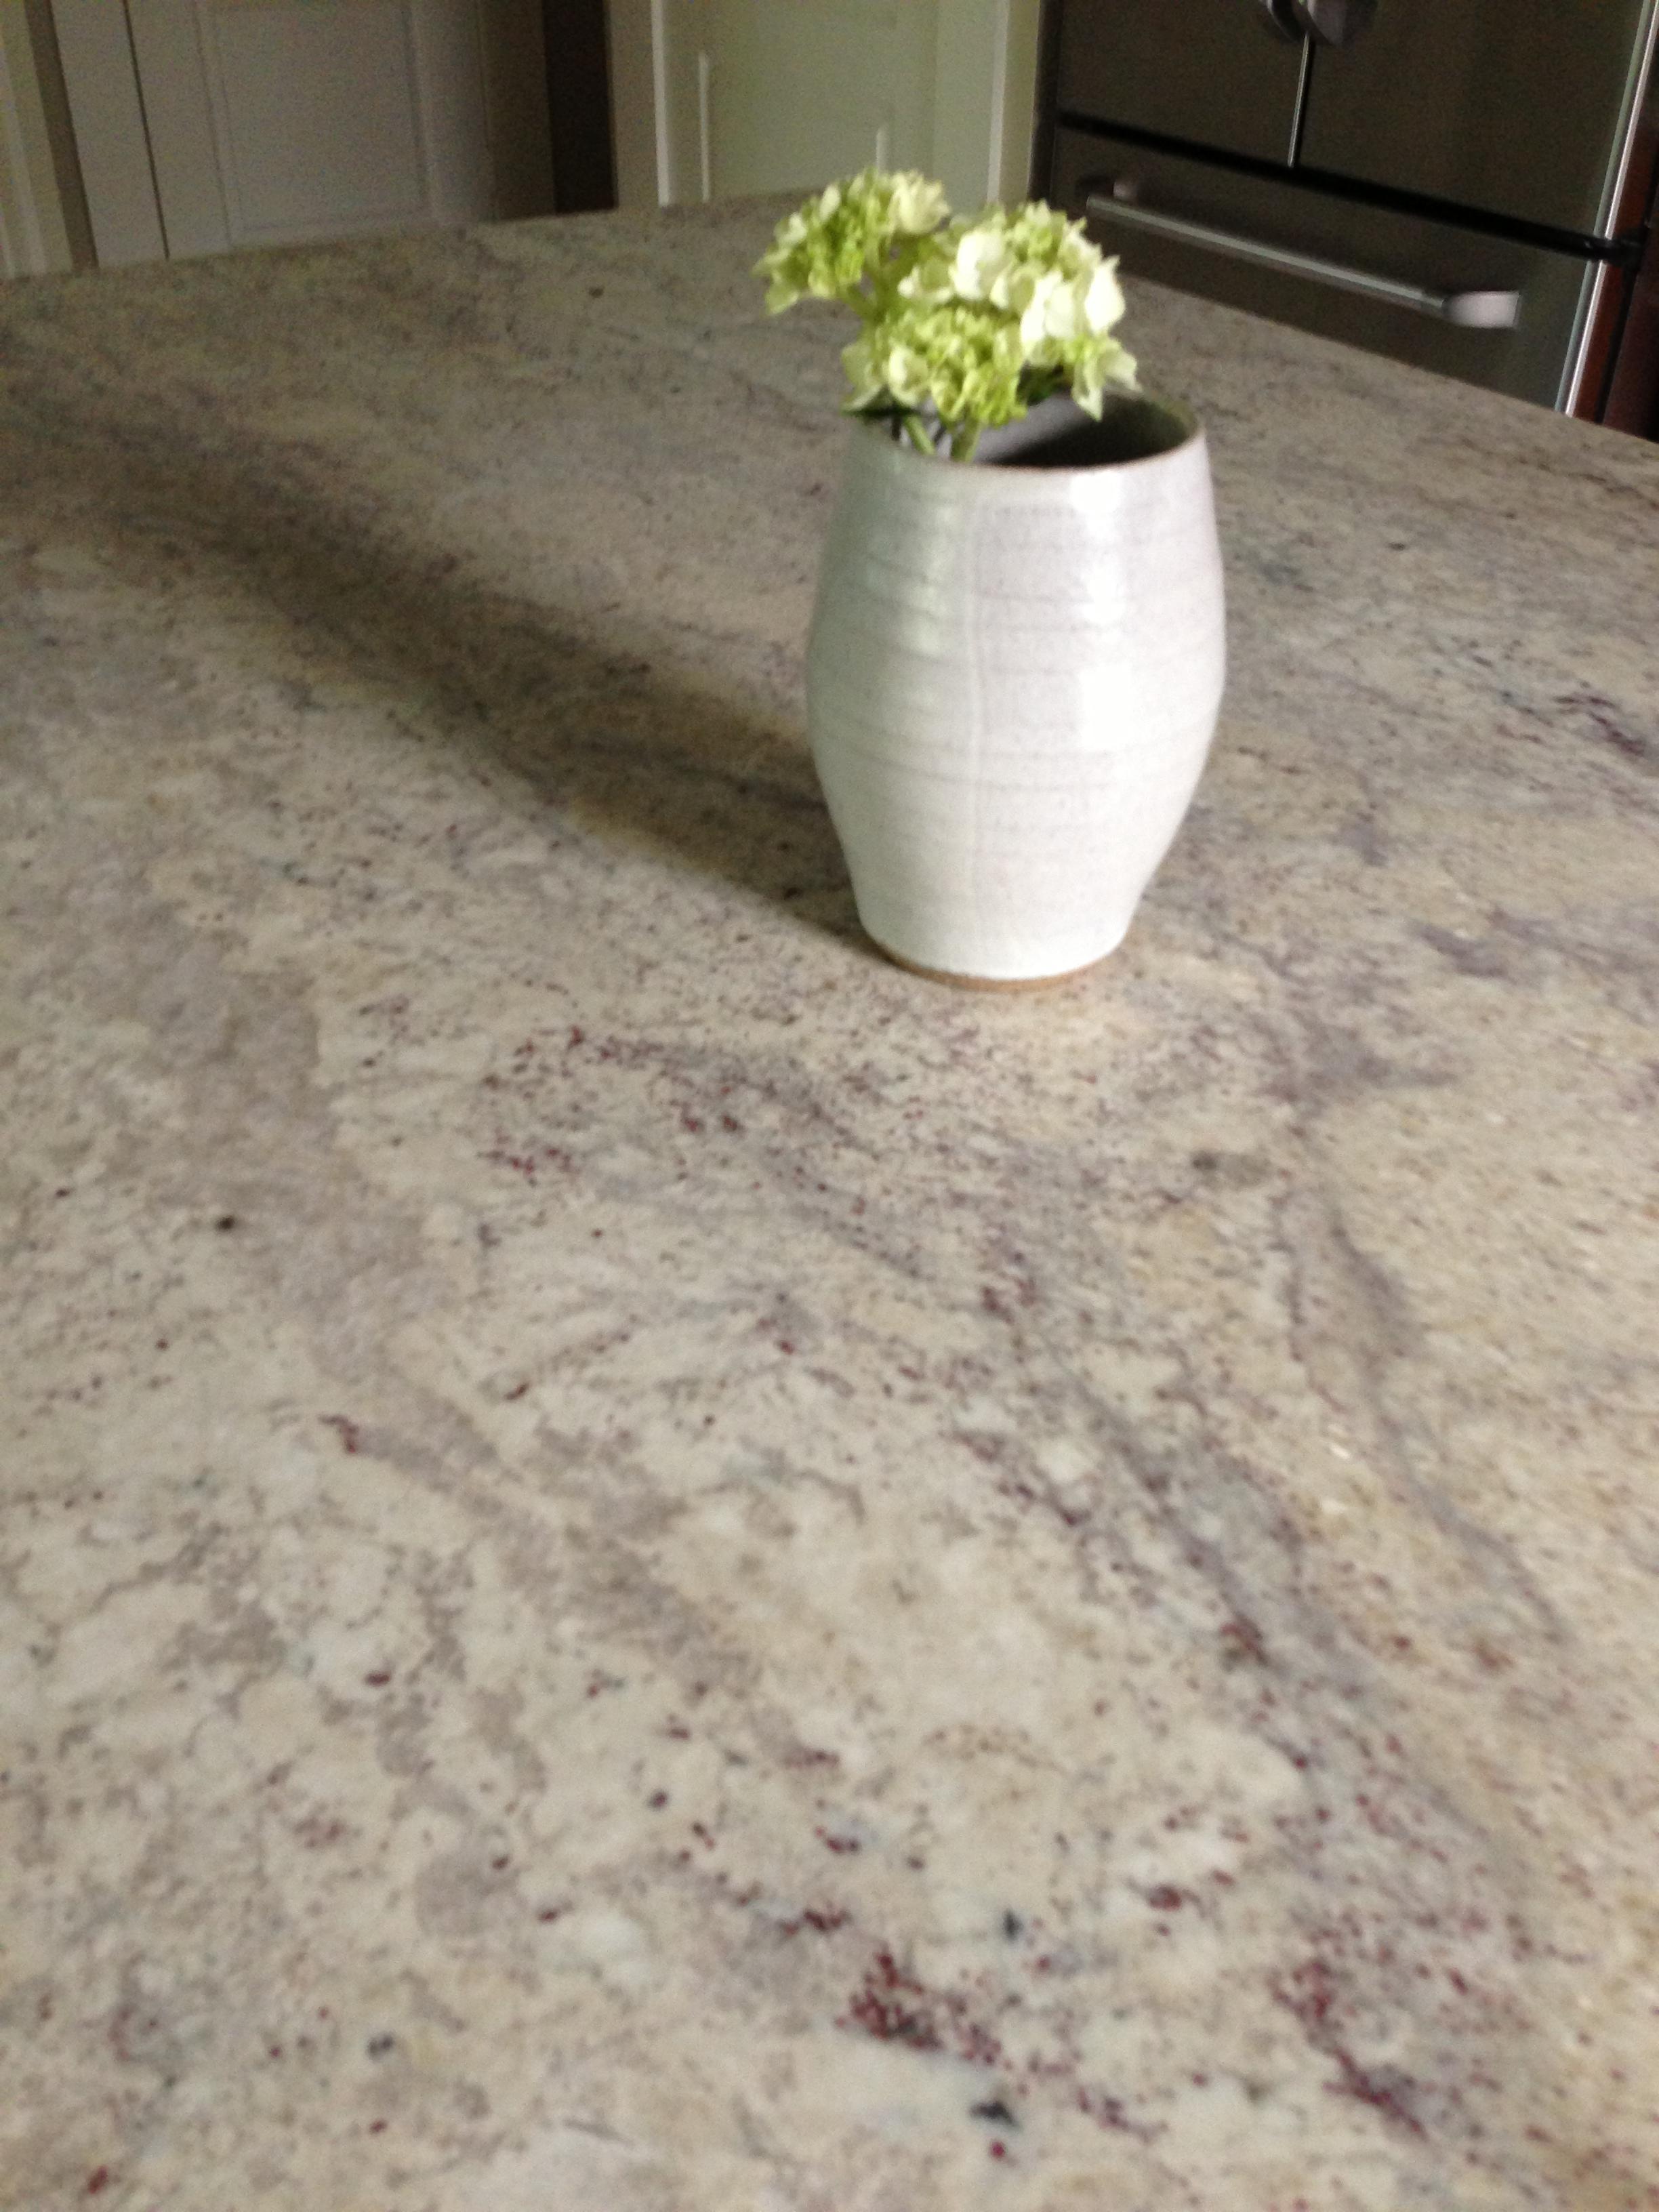 Kashmire White Granite in honed finish, Kitchen Remodel - Carla Aston, Designer